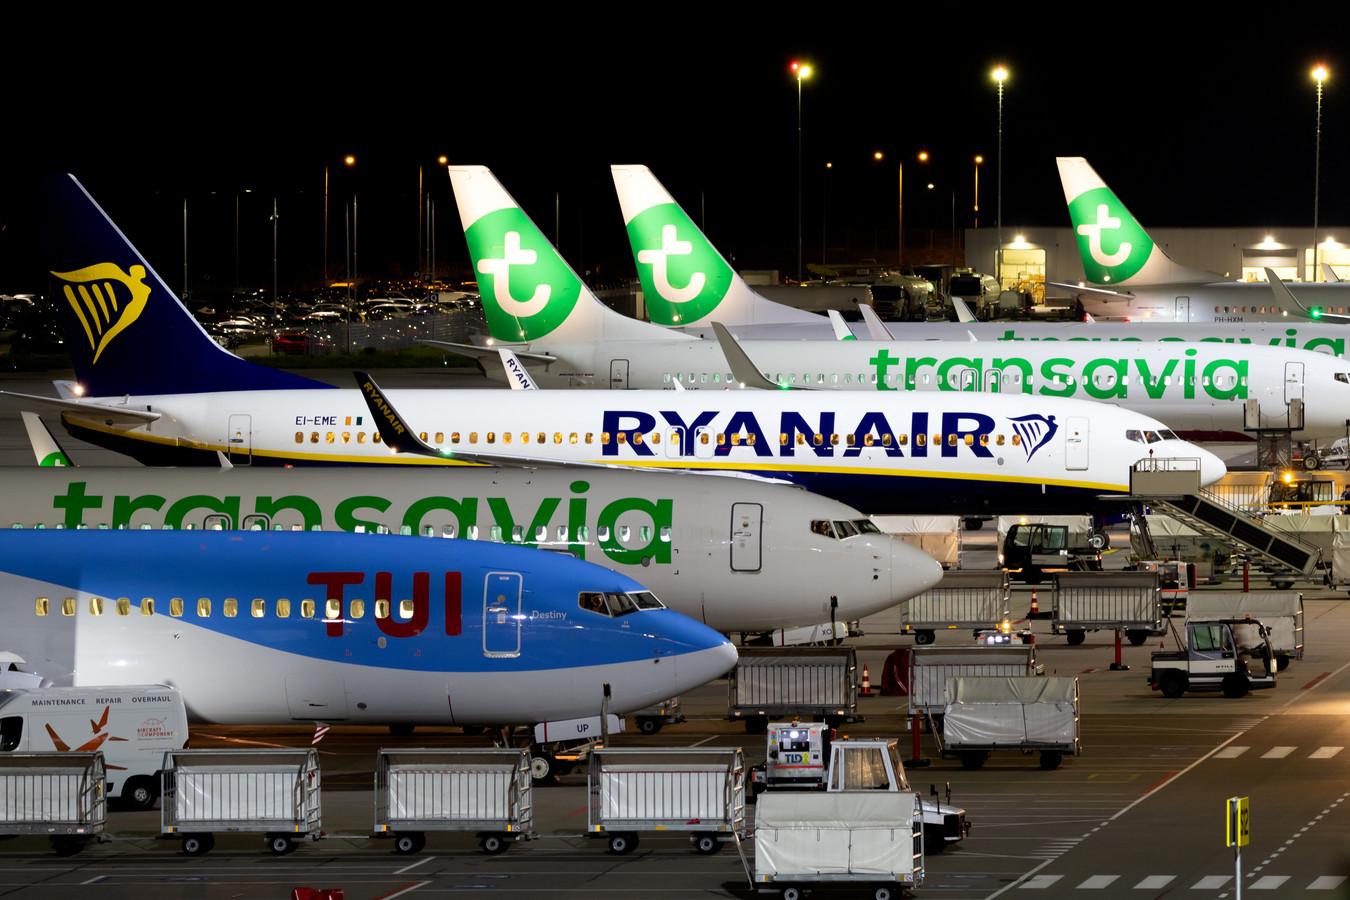 Vliegtuigen van Tui, Transavia en Ryanair op Eindhoven Airport.